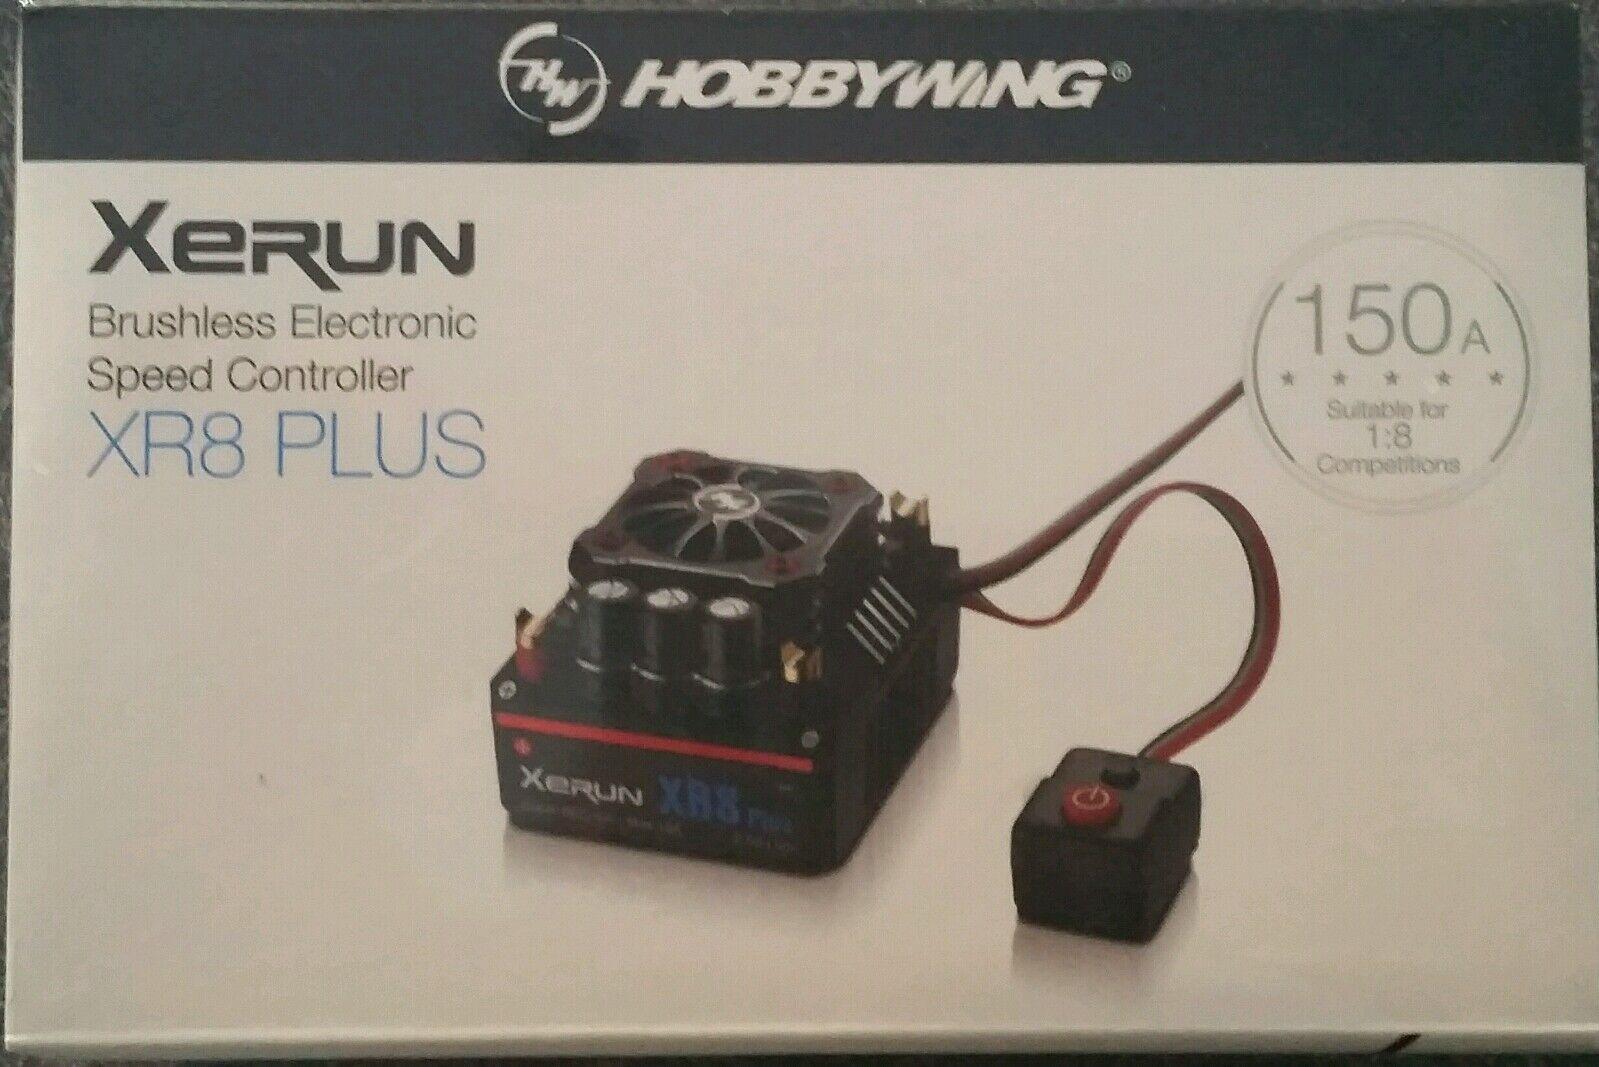 HOBBYWING XERUN 150A XR8 Sensored 1/8TH Esc, Genuino PLUS producto, Sellado